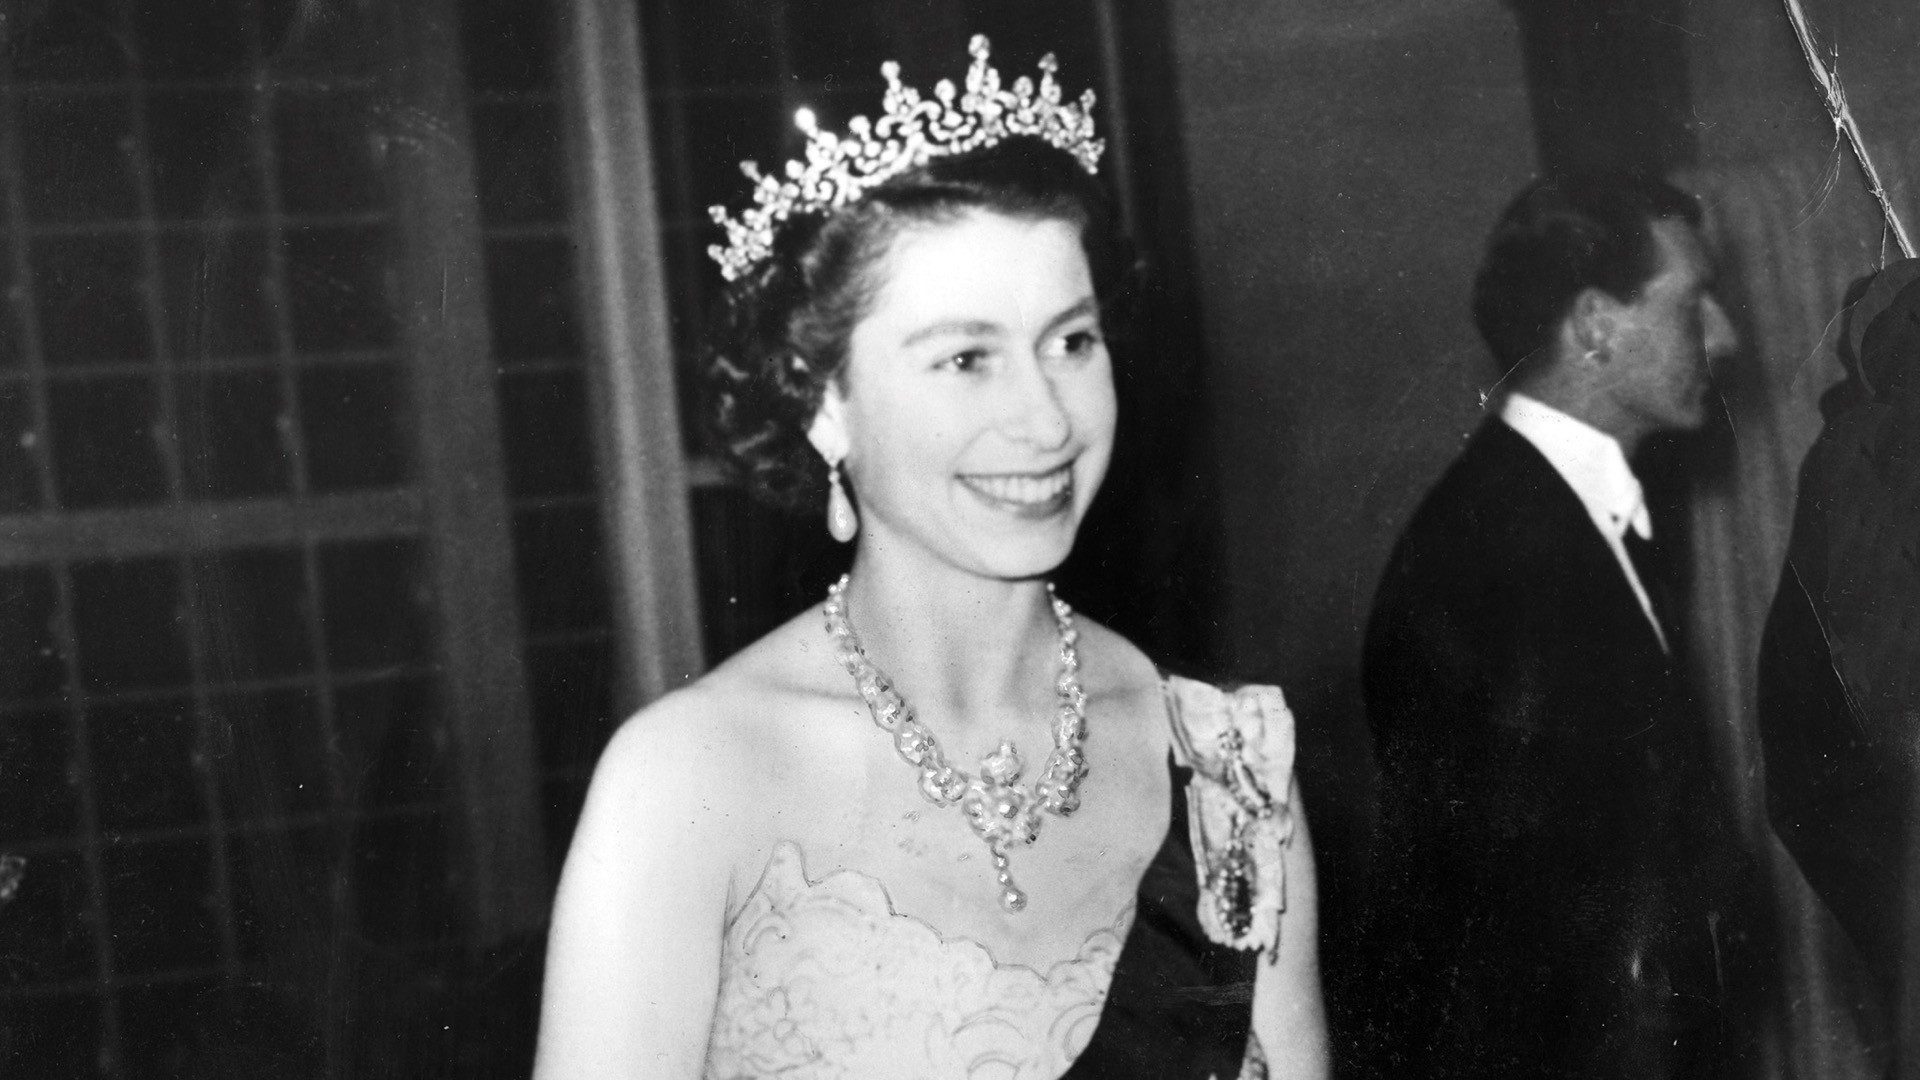 Queen Elizabeth celebrates 90 years of life